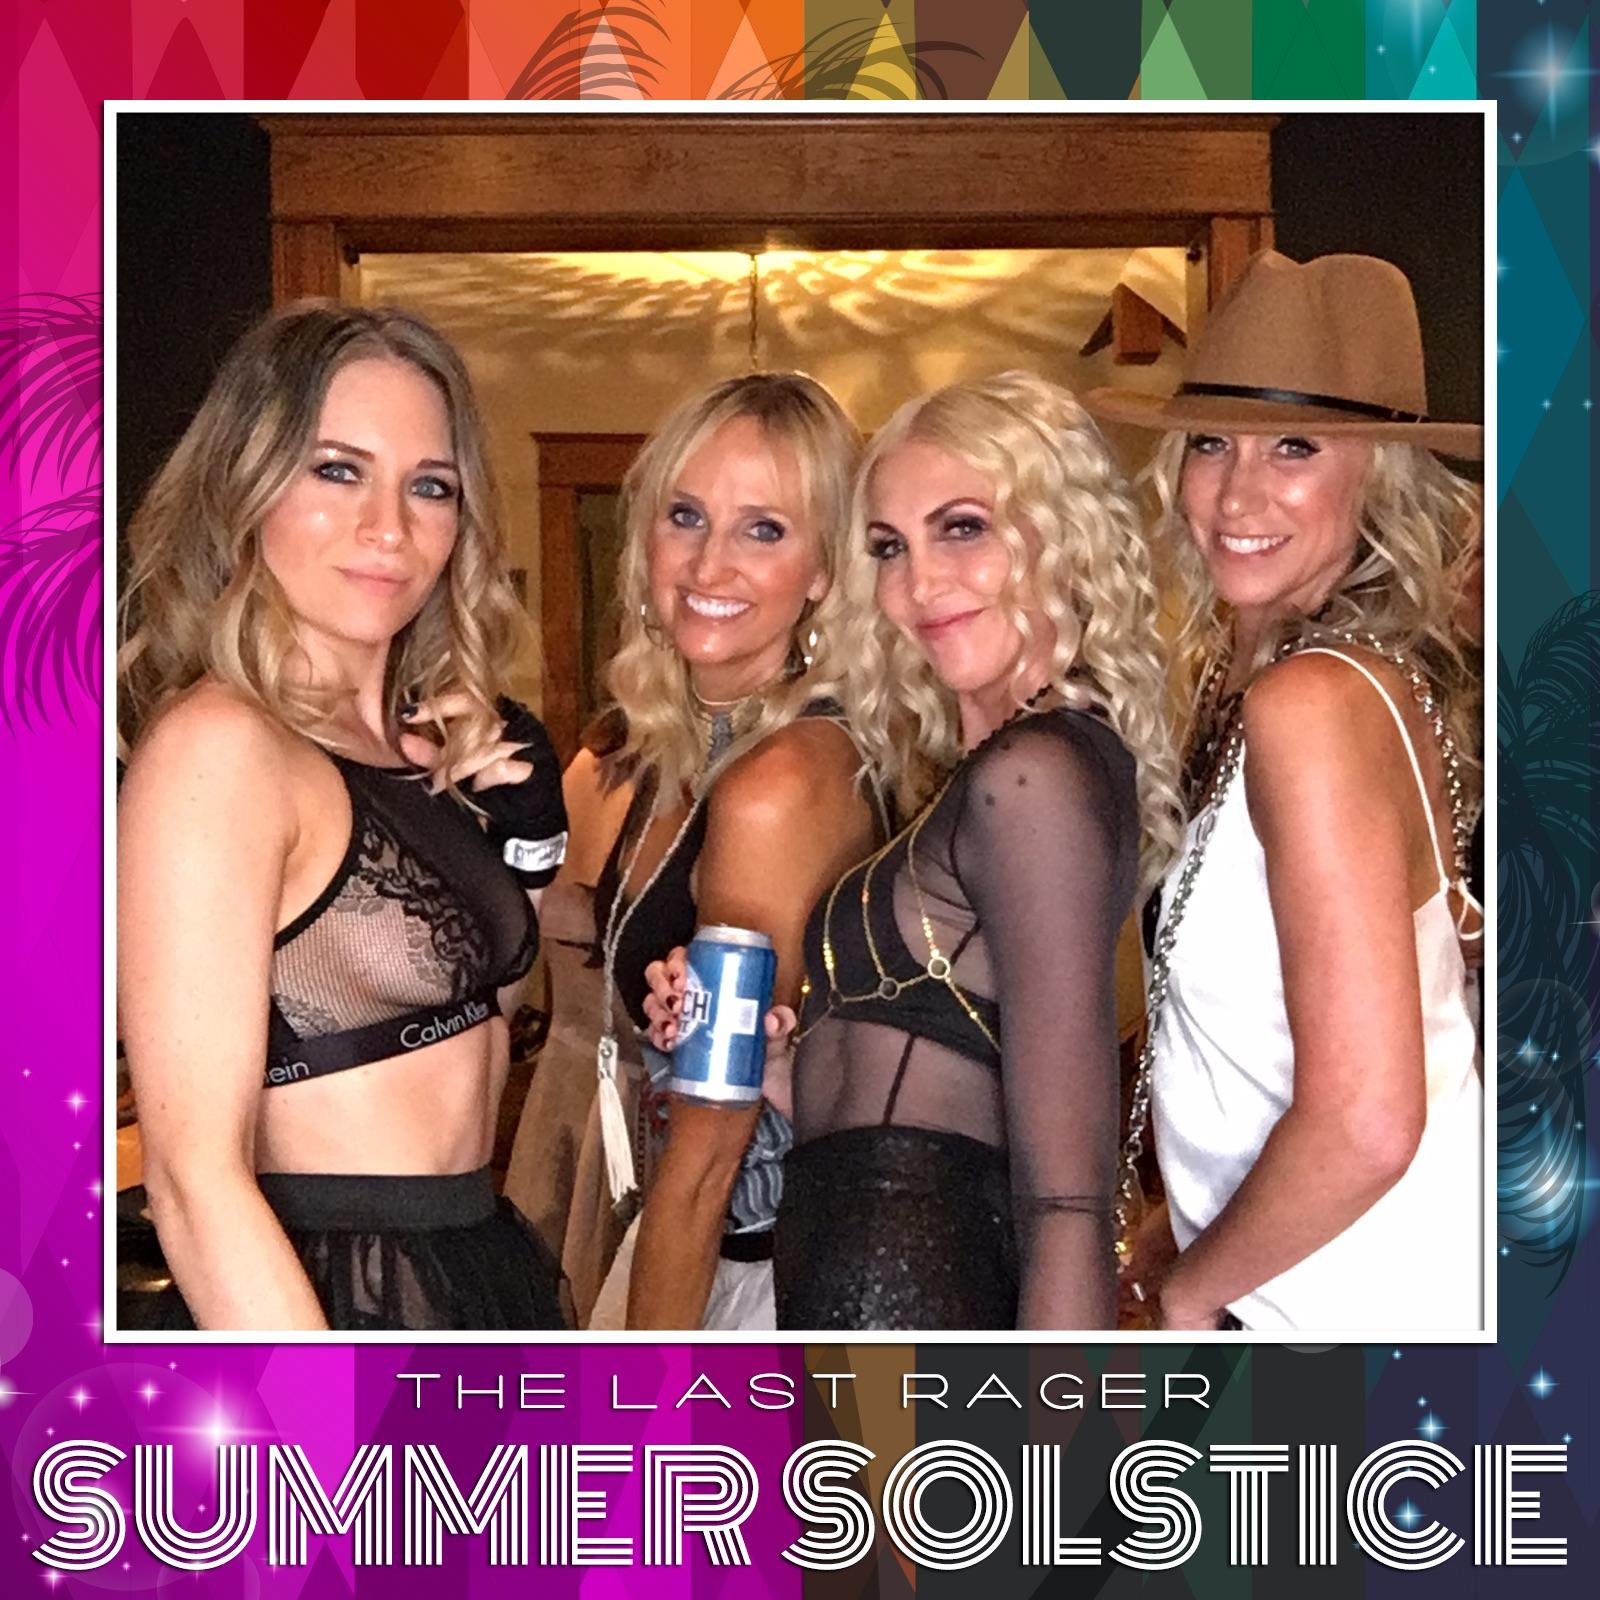 Last Rager Summer Solstice